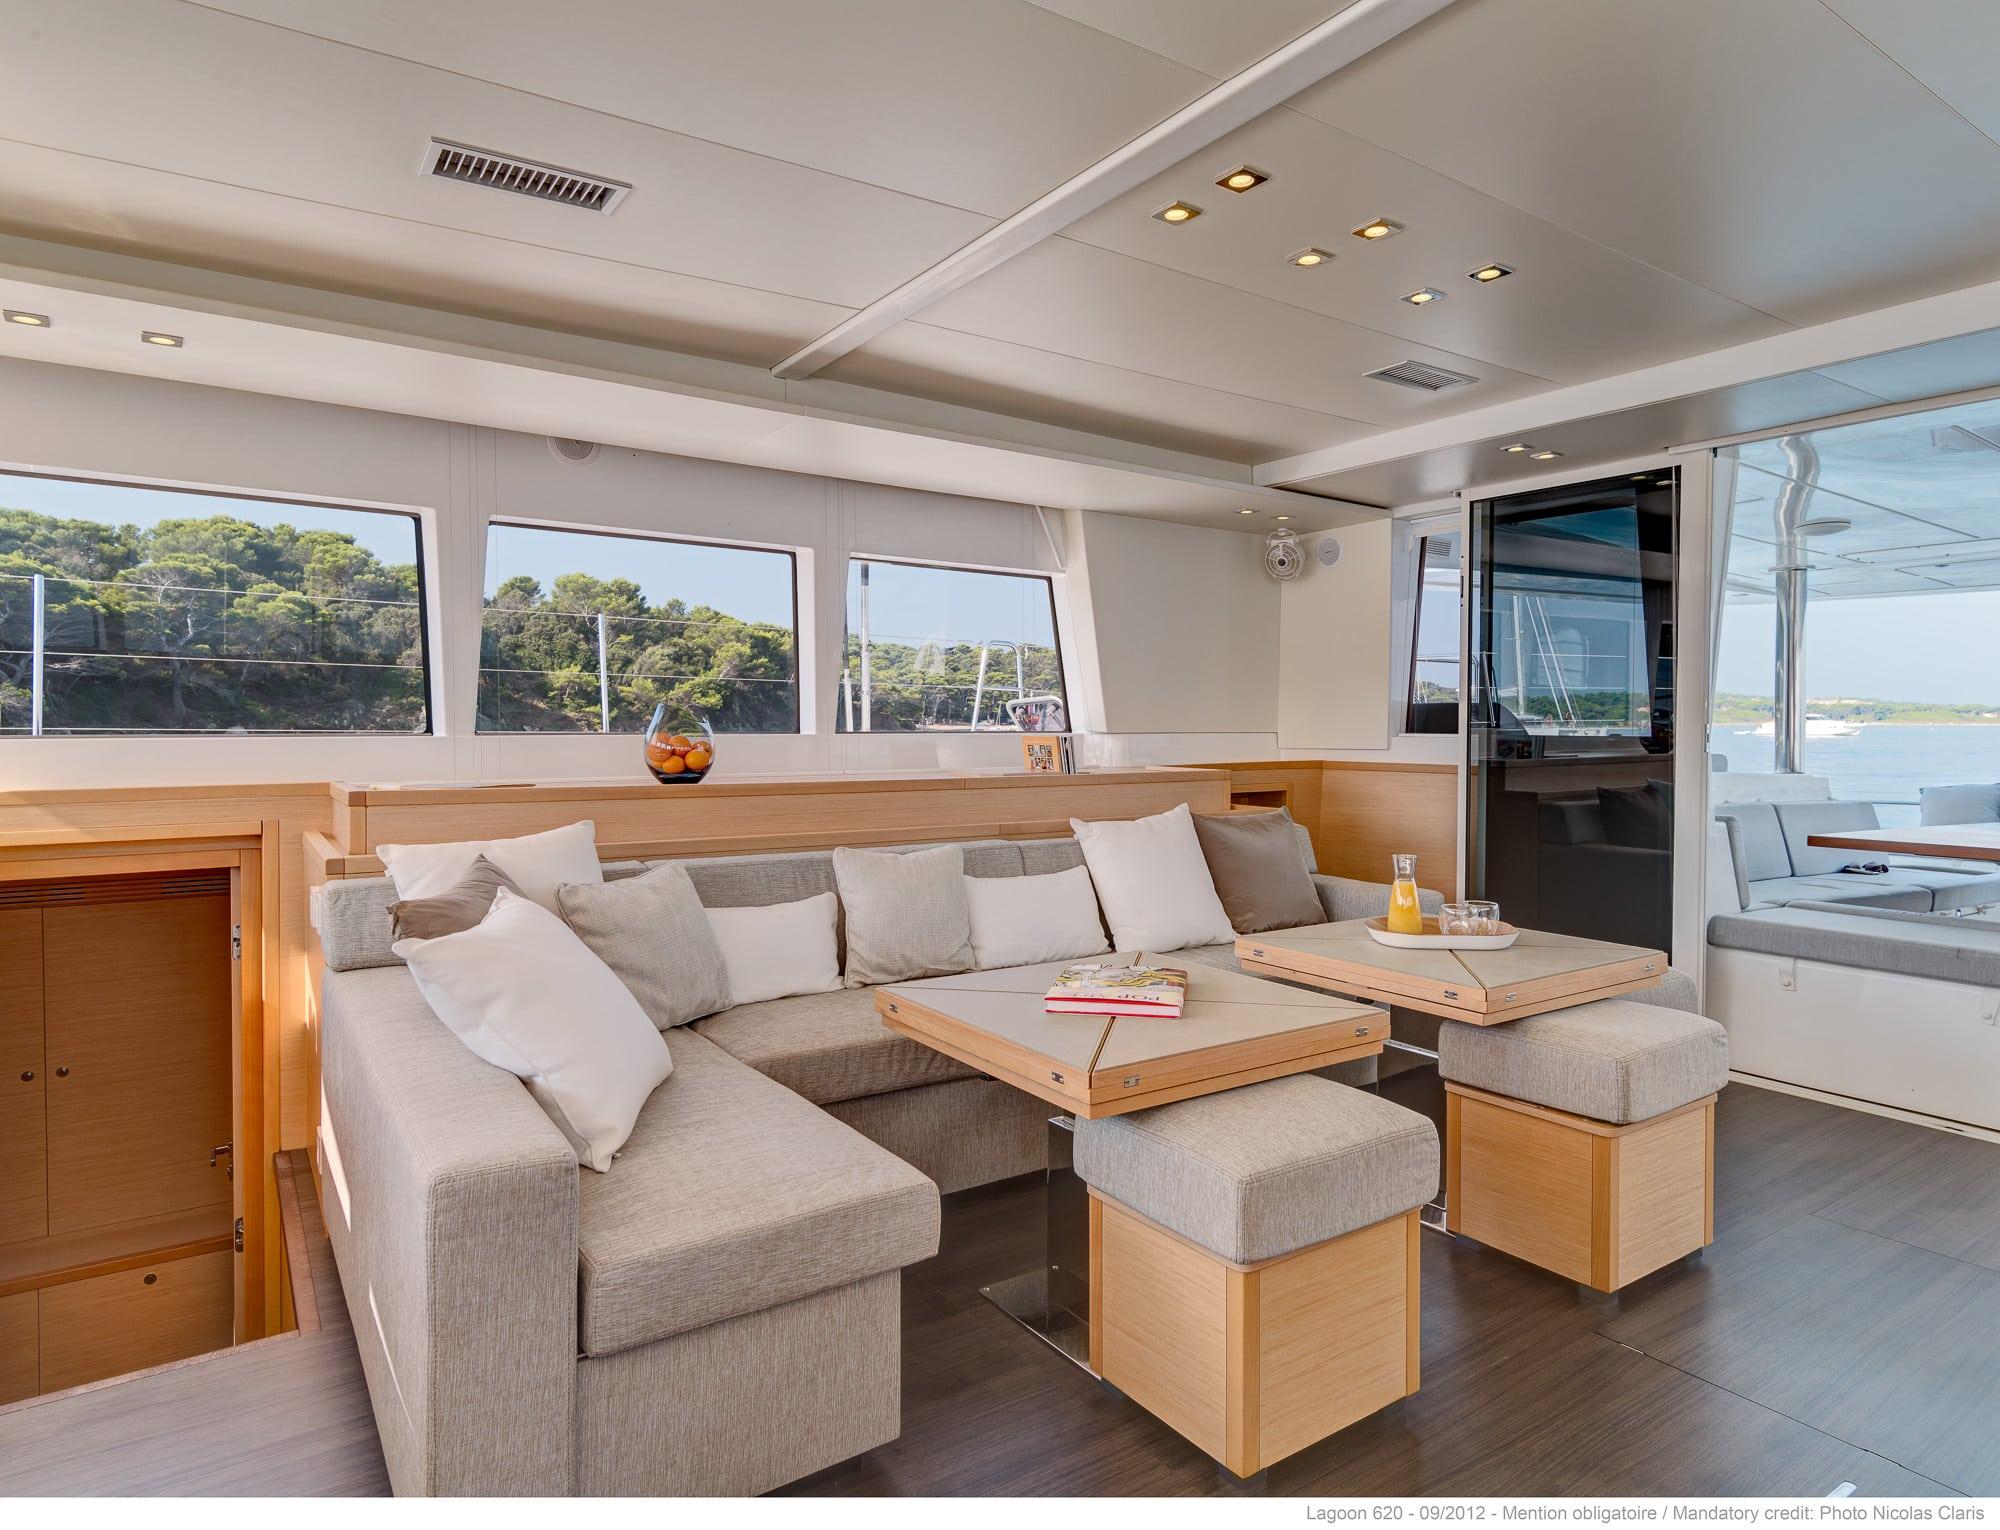 lagoon-620-yacht-charter-croatia-sailing-holidays-croatia-booking-yacht-charter-croatia-catamarans-sailboats-motorboats-gulets-luxury-yachts-boat-rental-croatia-13